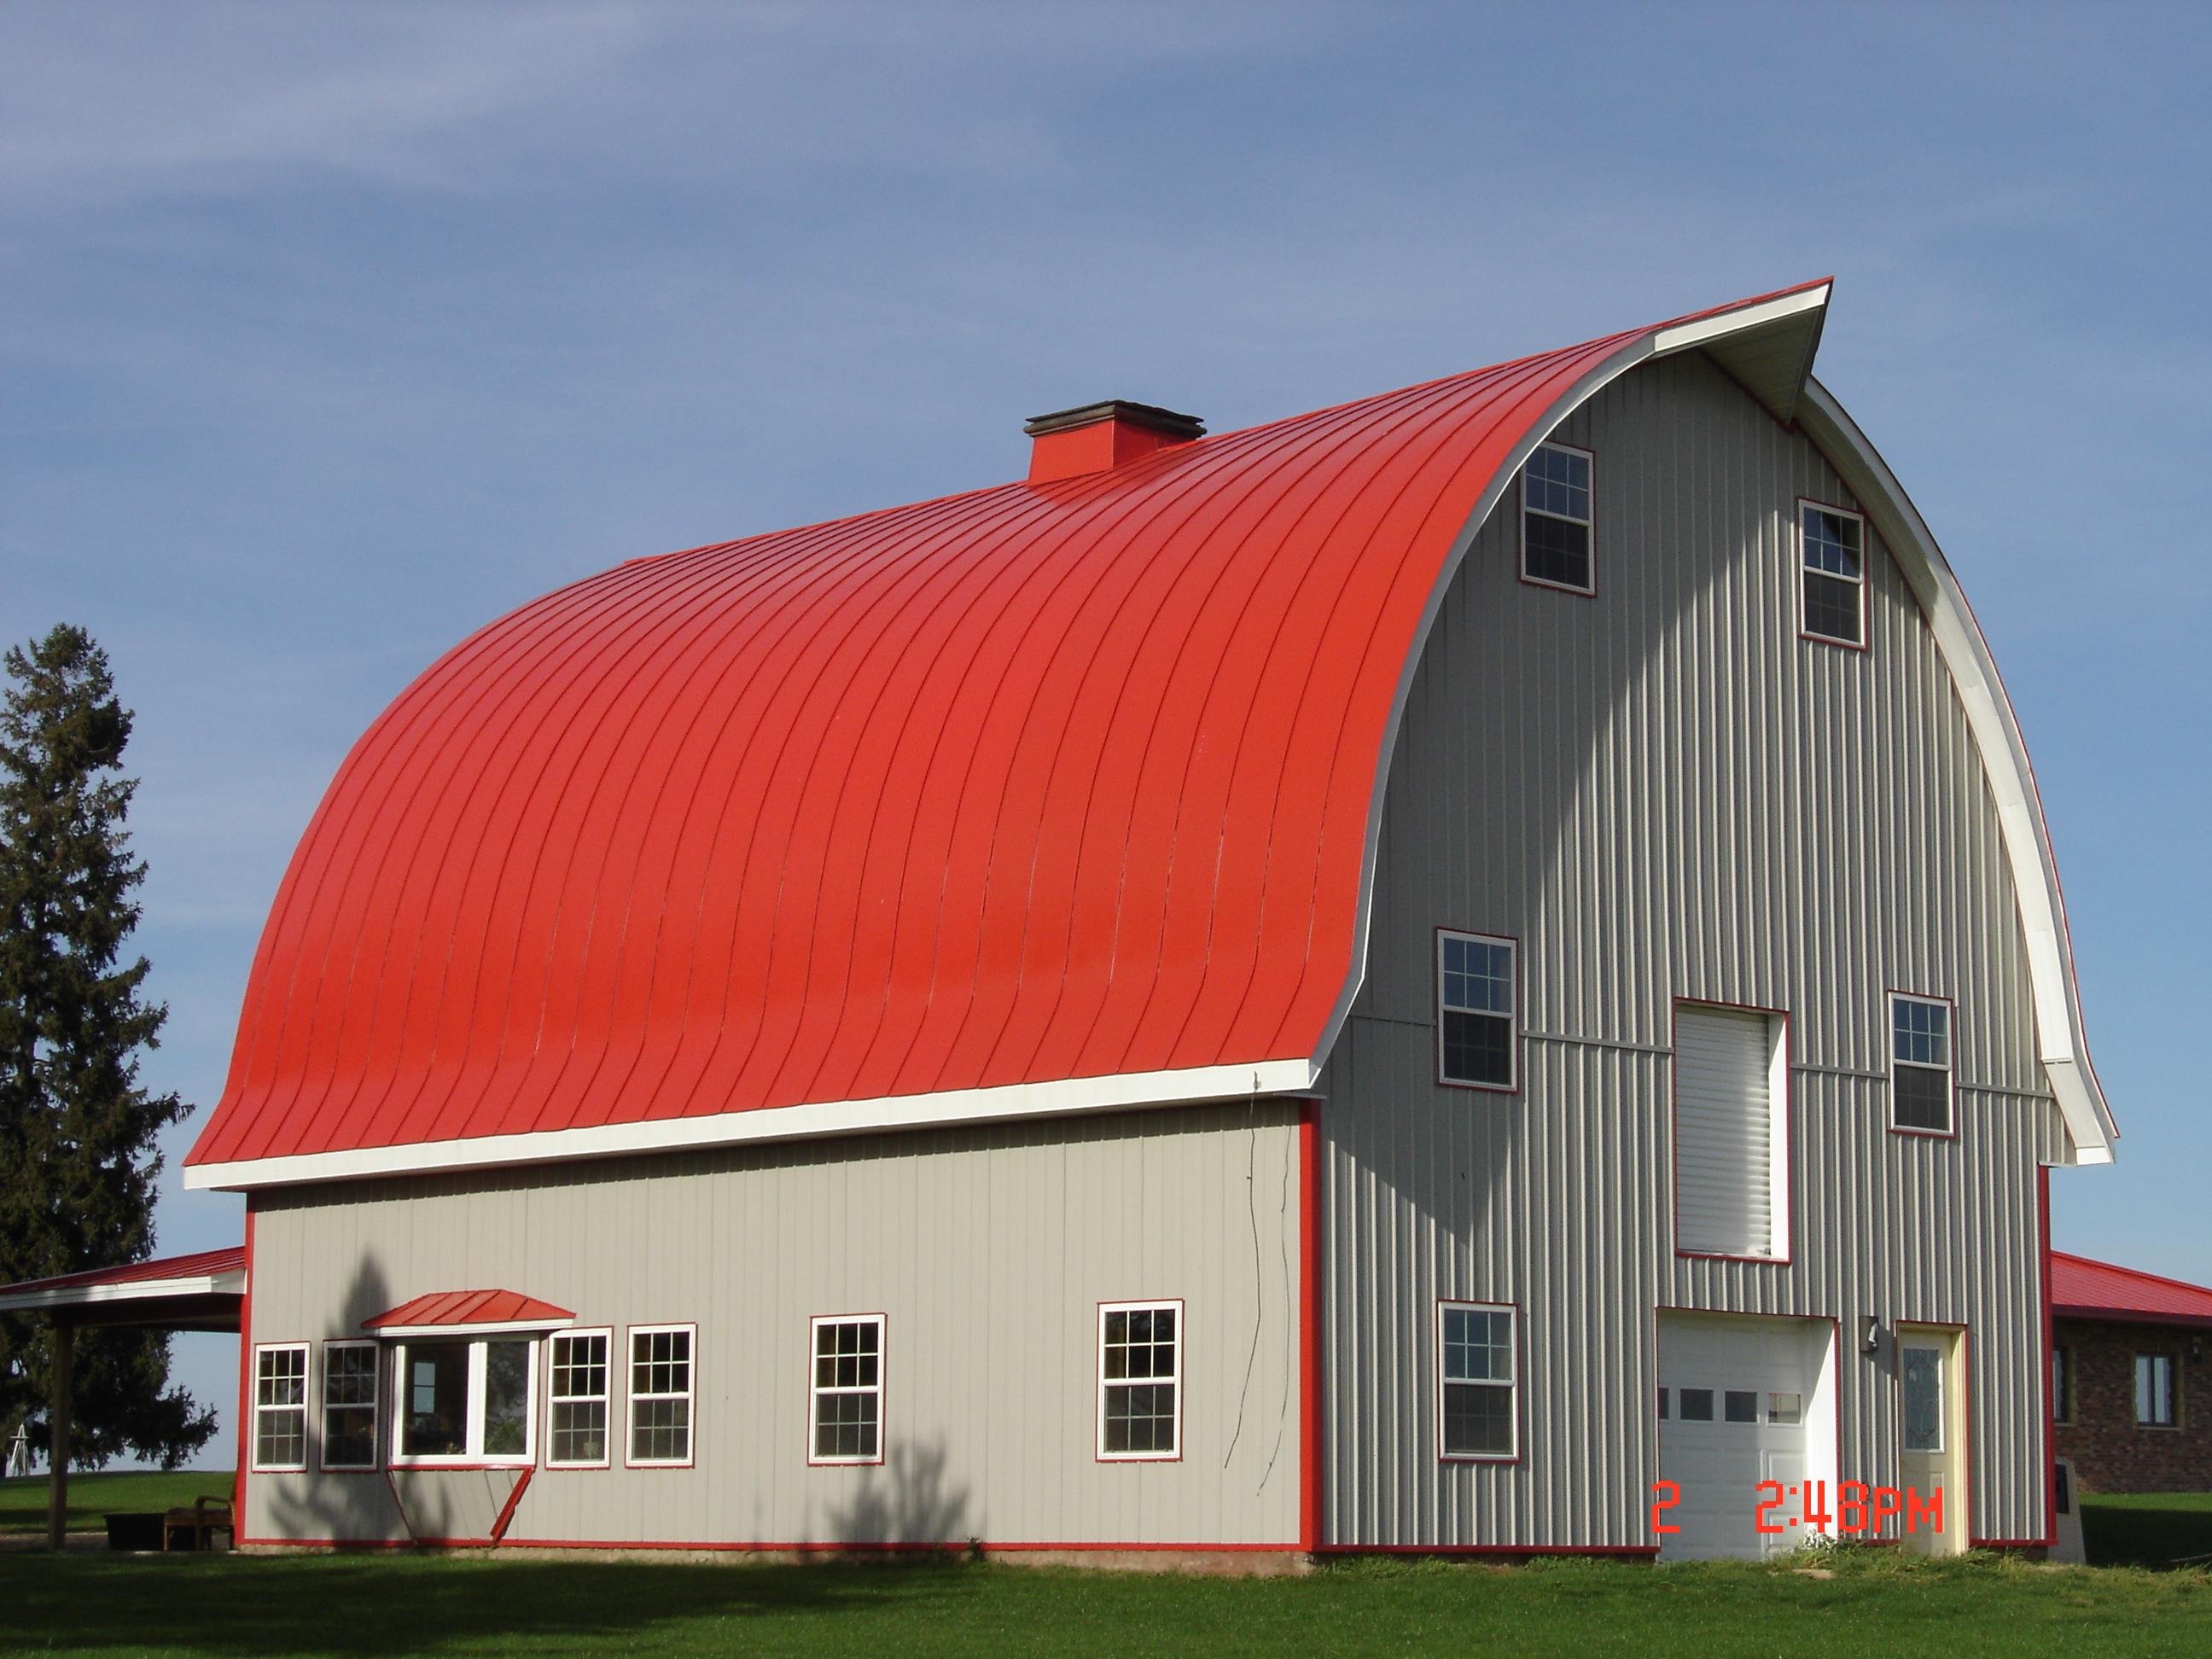 double lock Standing seam sheet metal roofing regal red gothic barn agricultural culpitt wisconsin iowa illinois minnesota north dakota